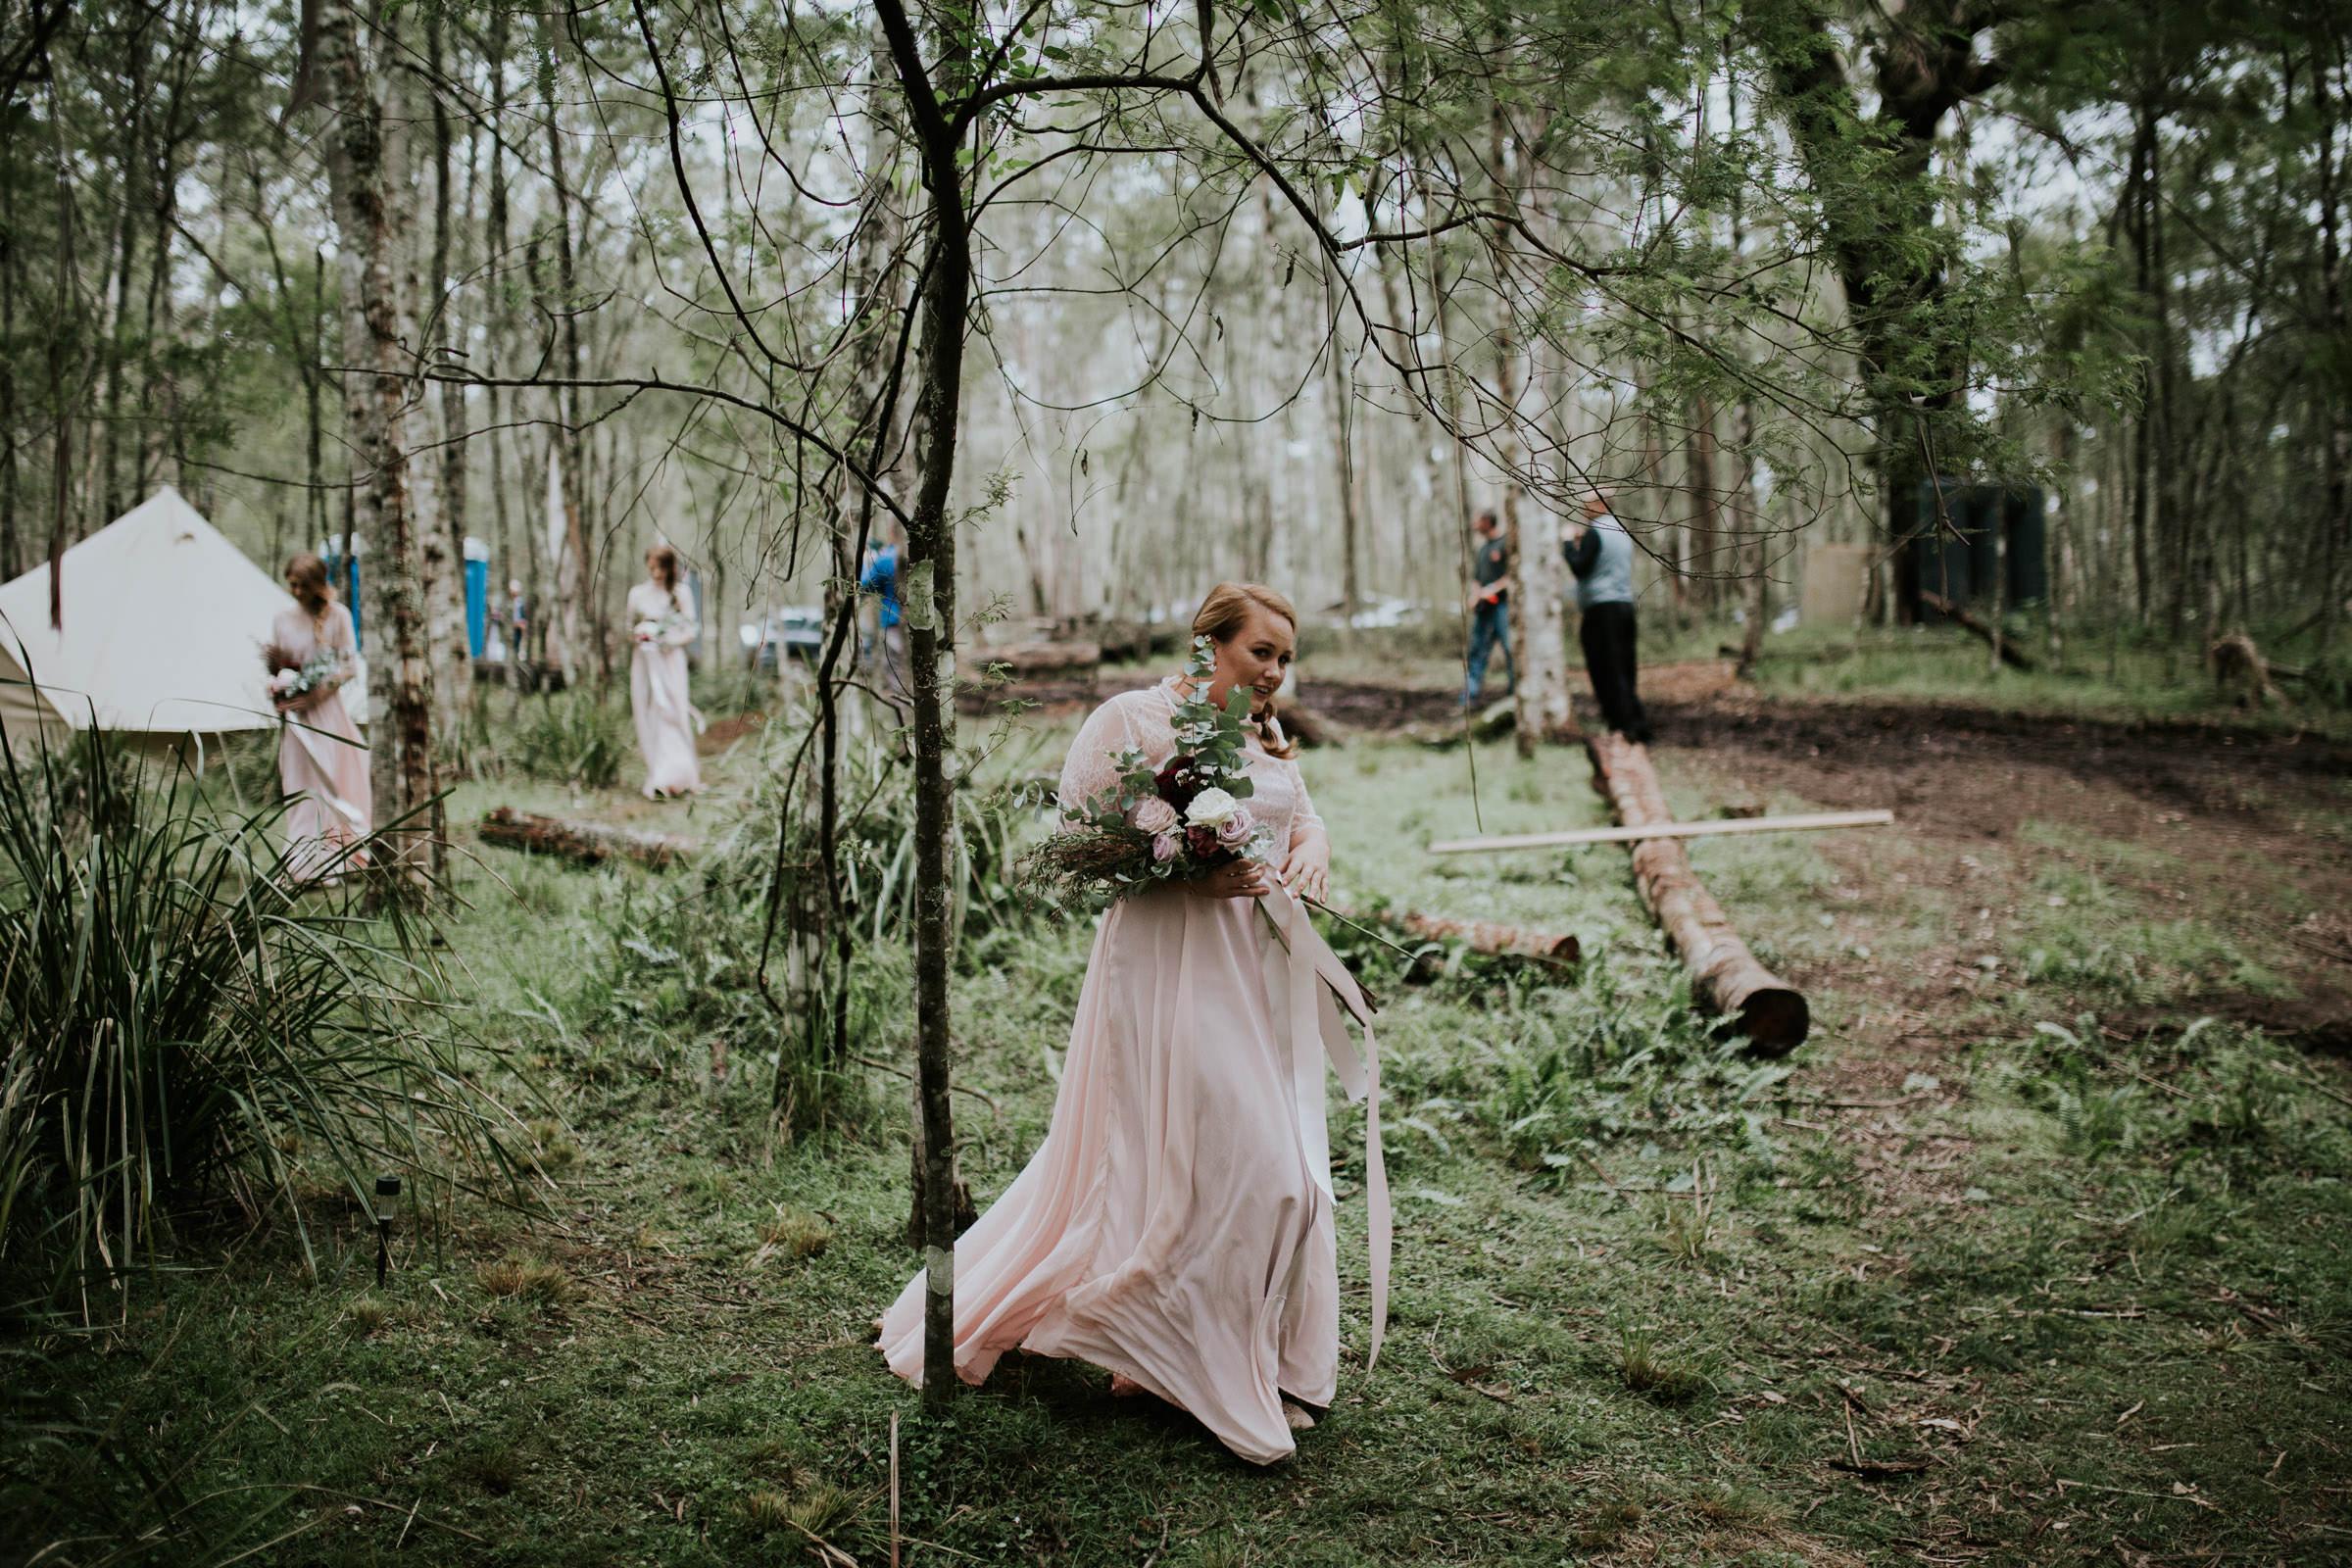 Emma+John+Far+South+Coast+Wedding+Festivl+Glamping+Bush-88.jpg